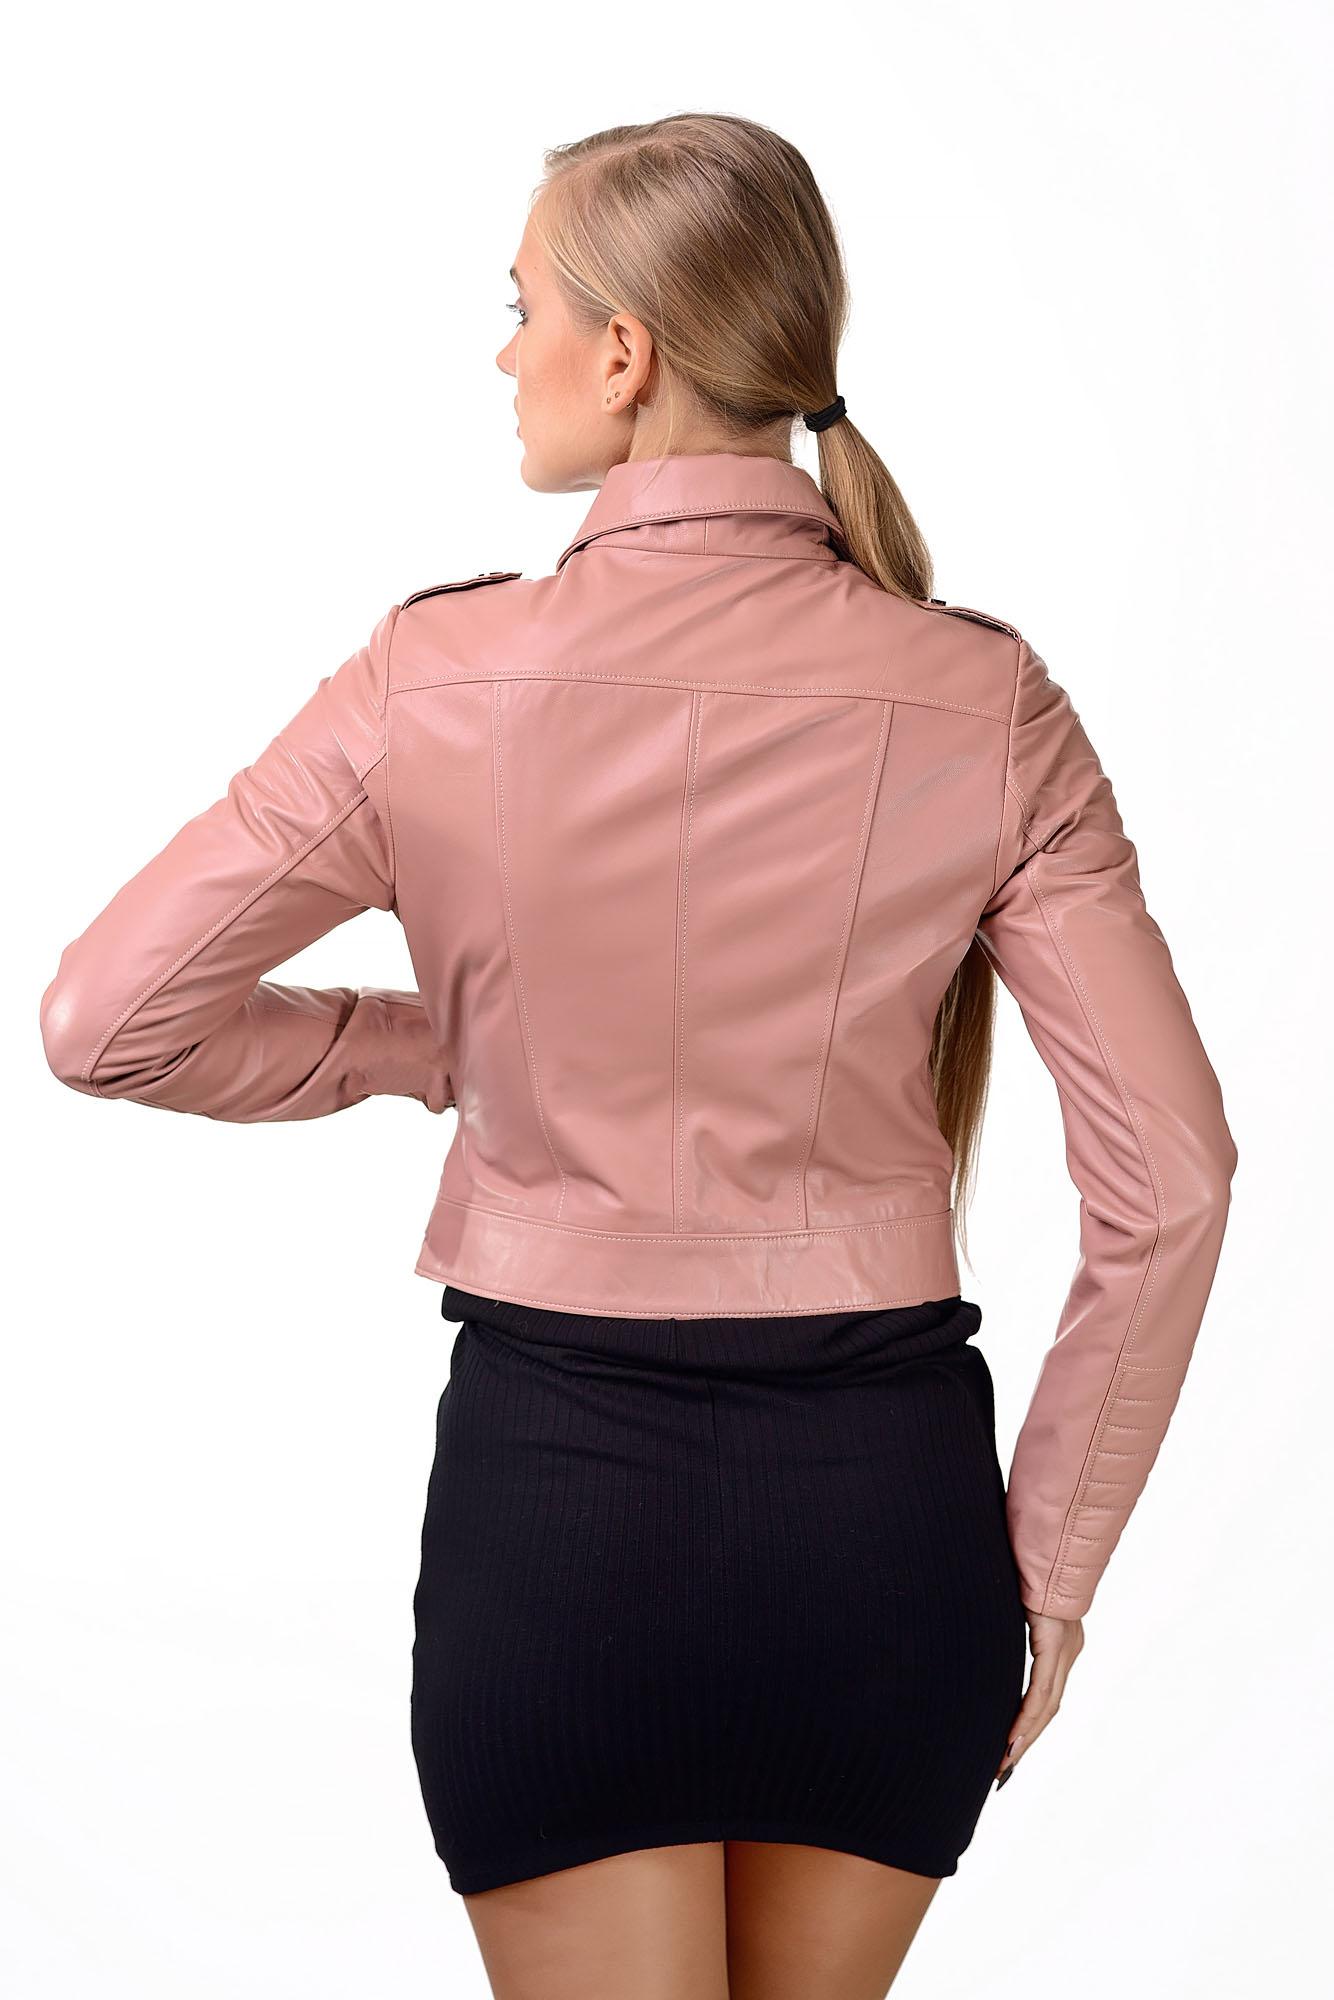 Женская кожаная куртка — косухаM=170